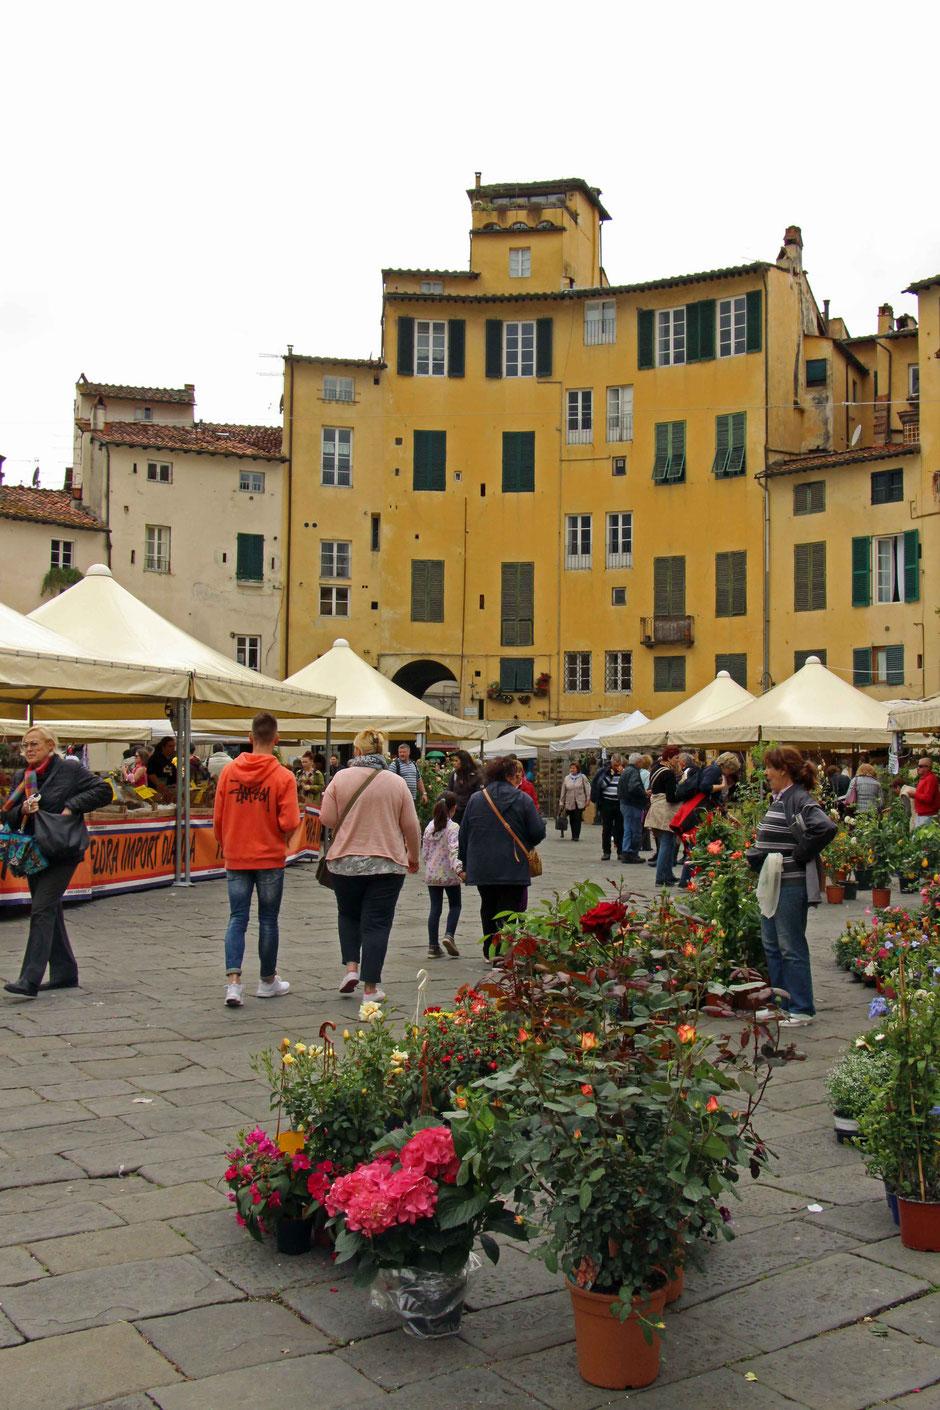 Piazza dell'Anfiteatro Lucca Italy